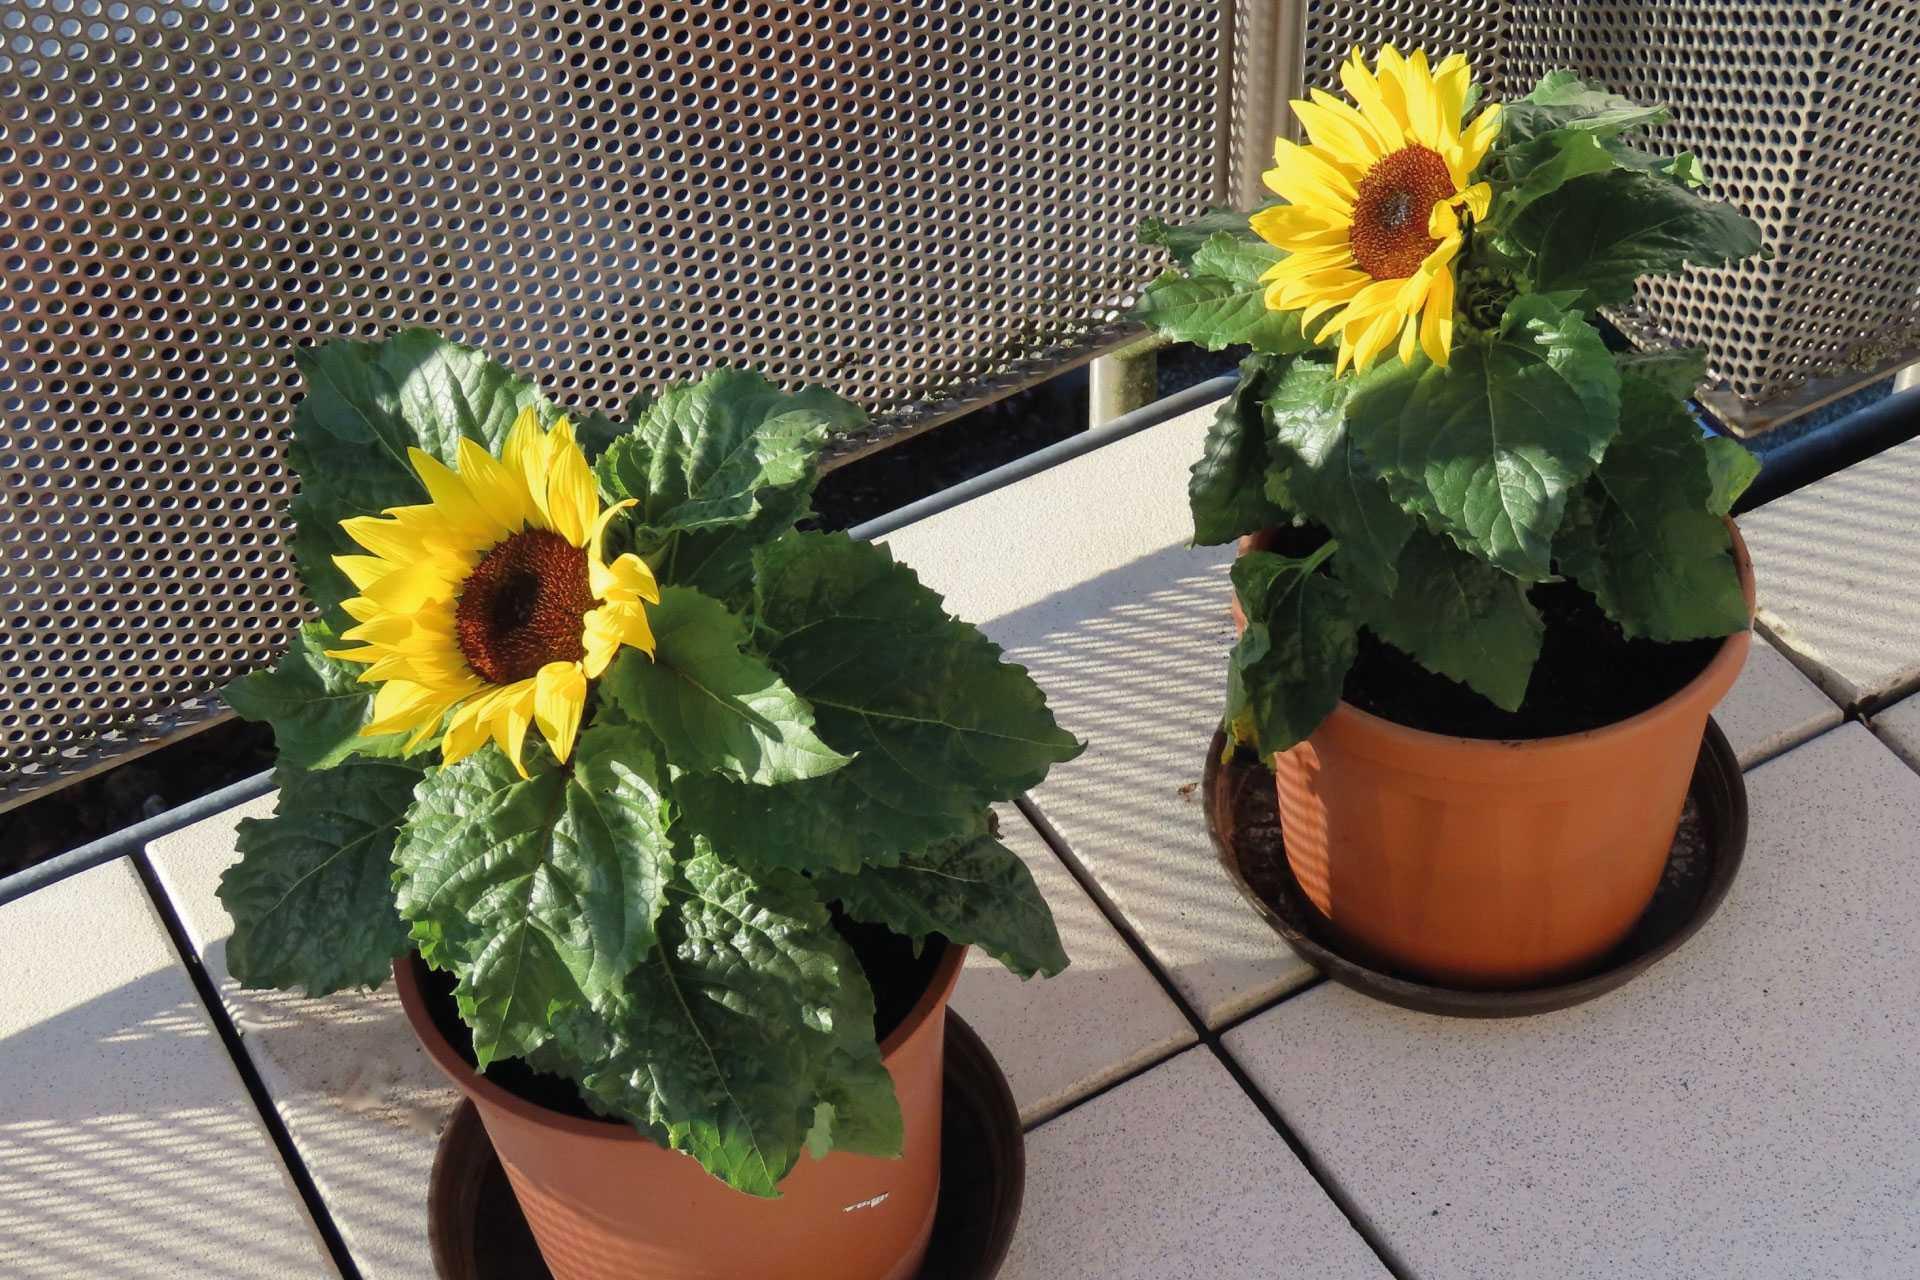 21 Winterharte Balkonpflanzen